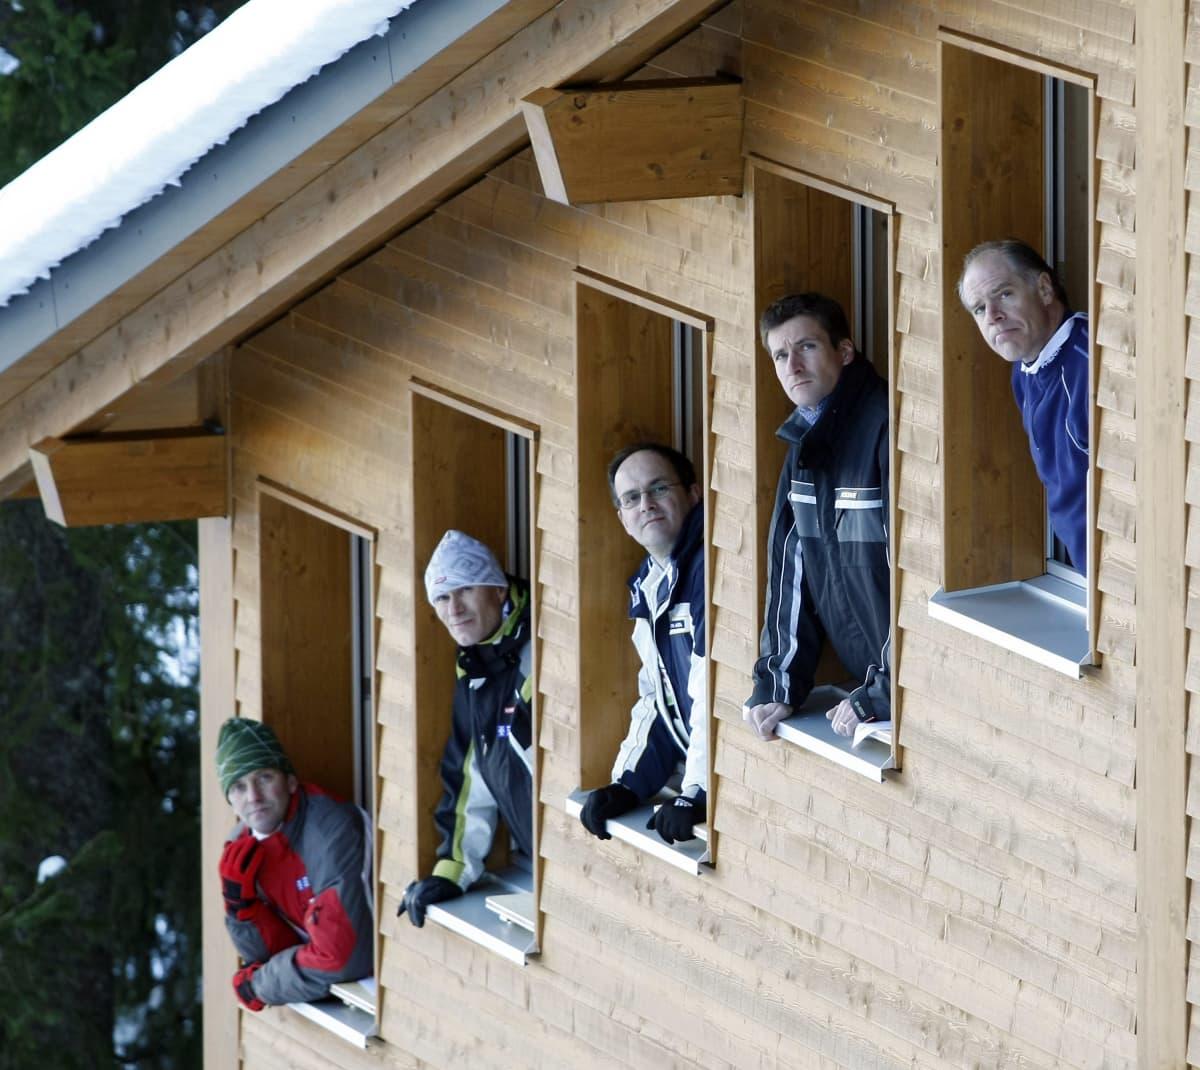 Jiri Parma (CZE), Mika Jukkara (FIN), Bostjan Ahacic (SLO), Christian Würsten (SUI) Kim Fripp (CAN)